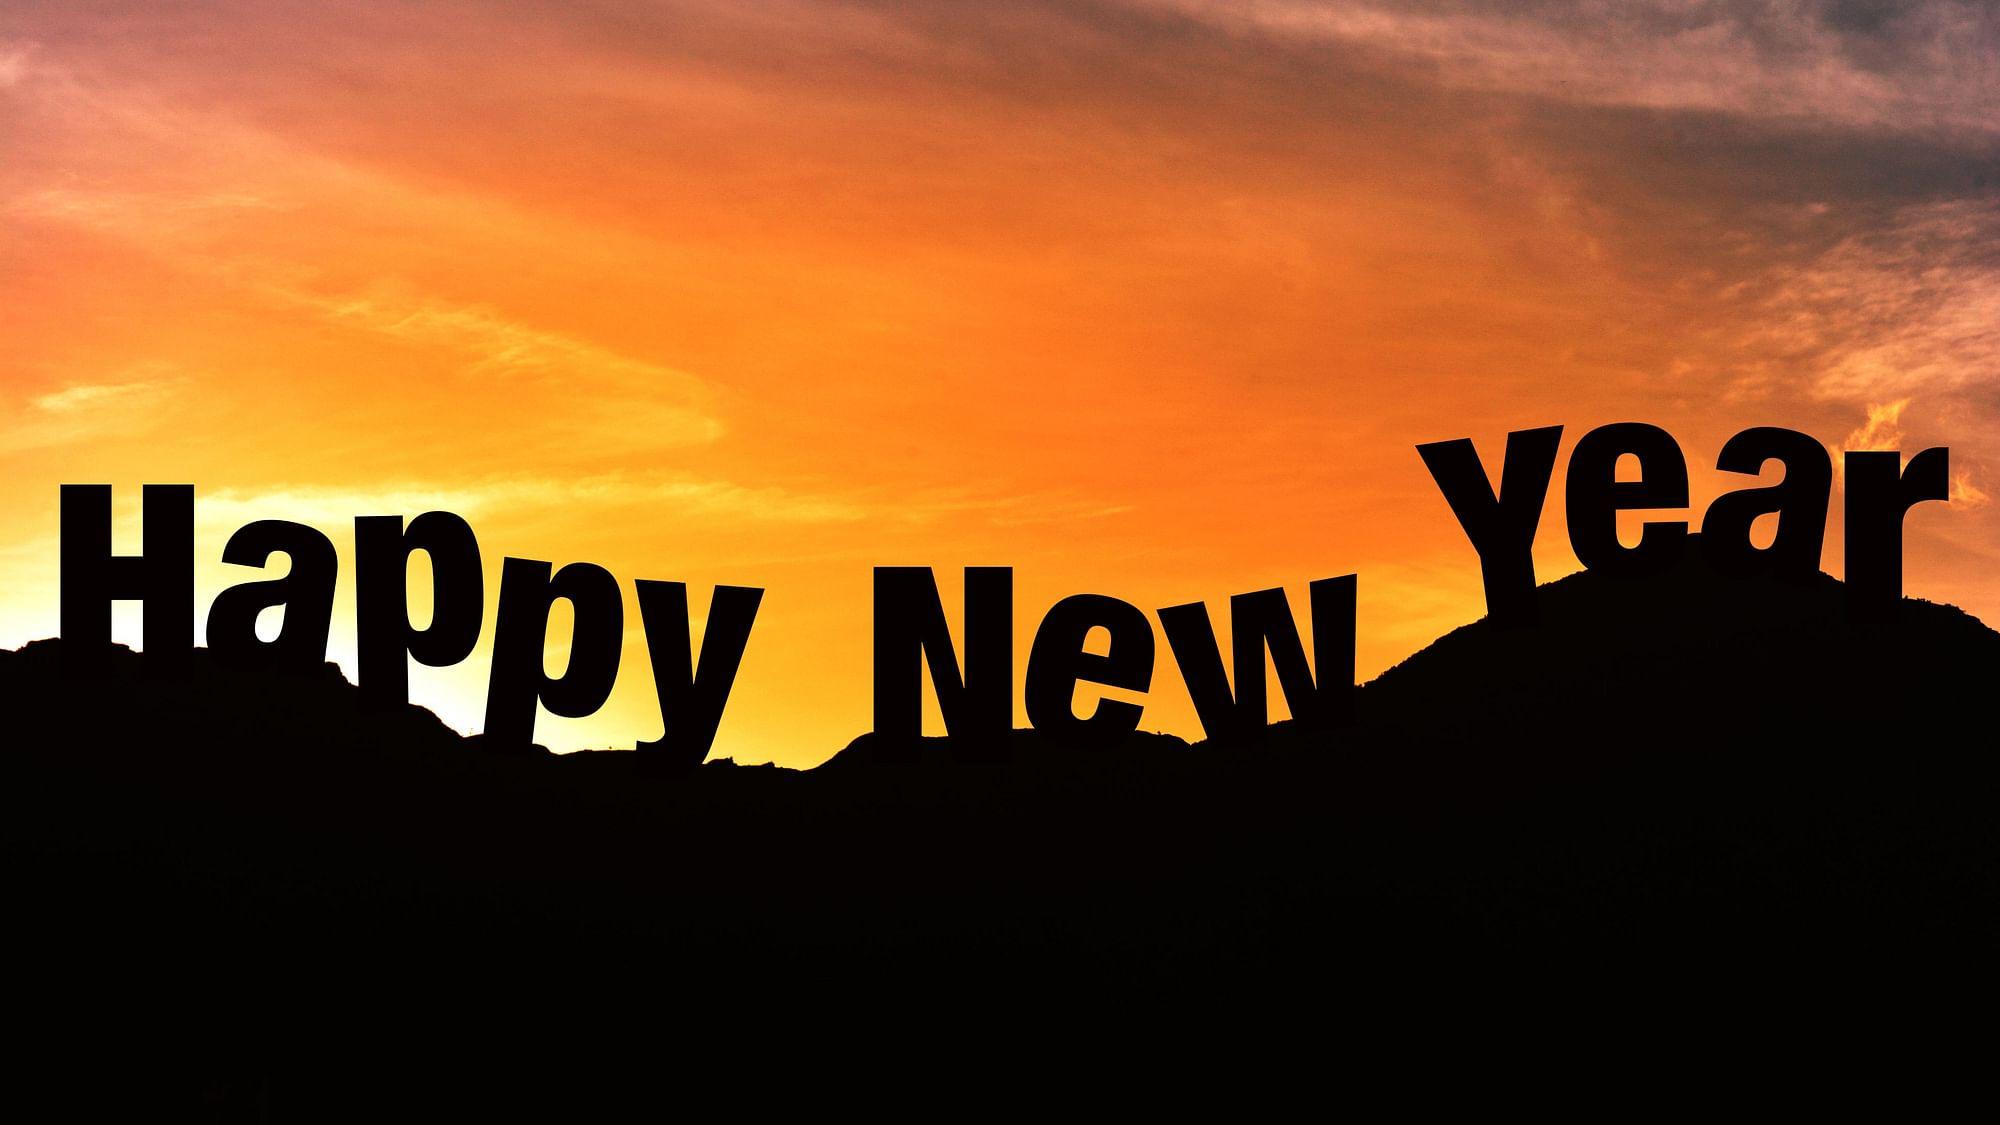 parsi new year wishes in english hindi gujarati parsi happy